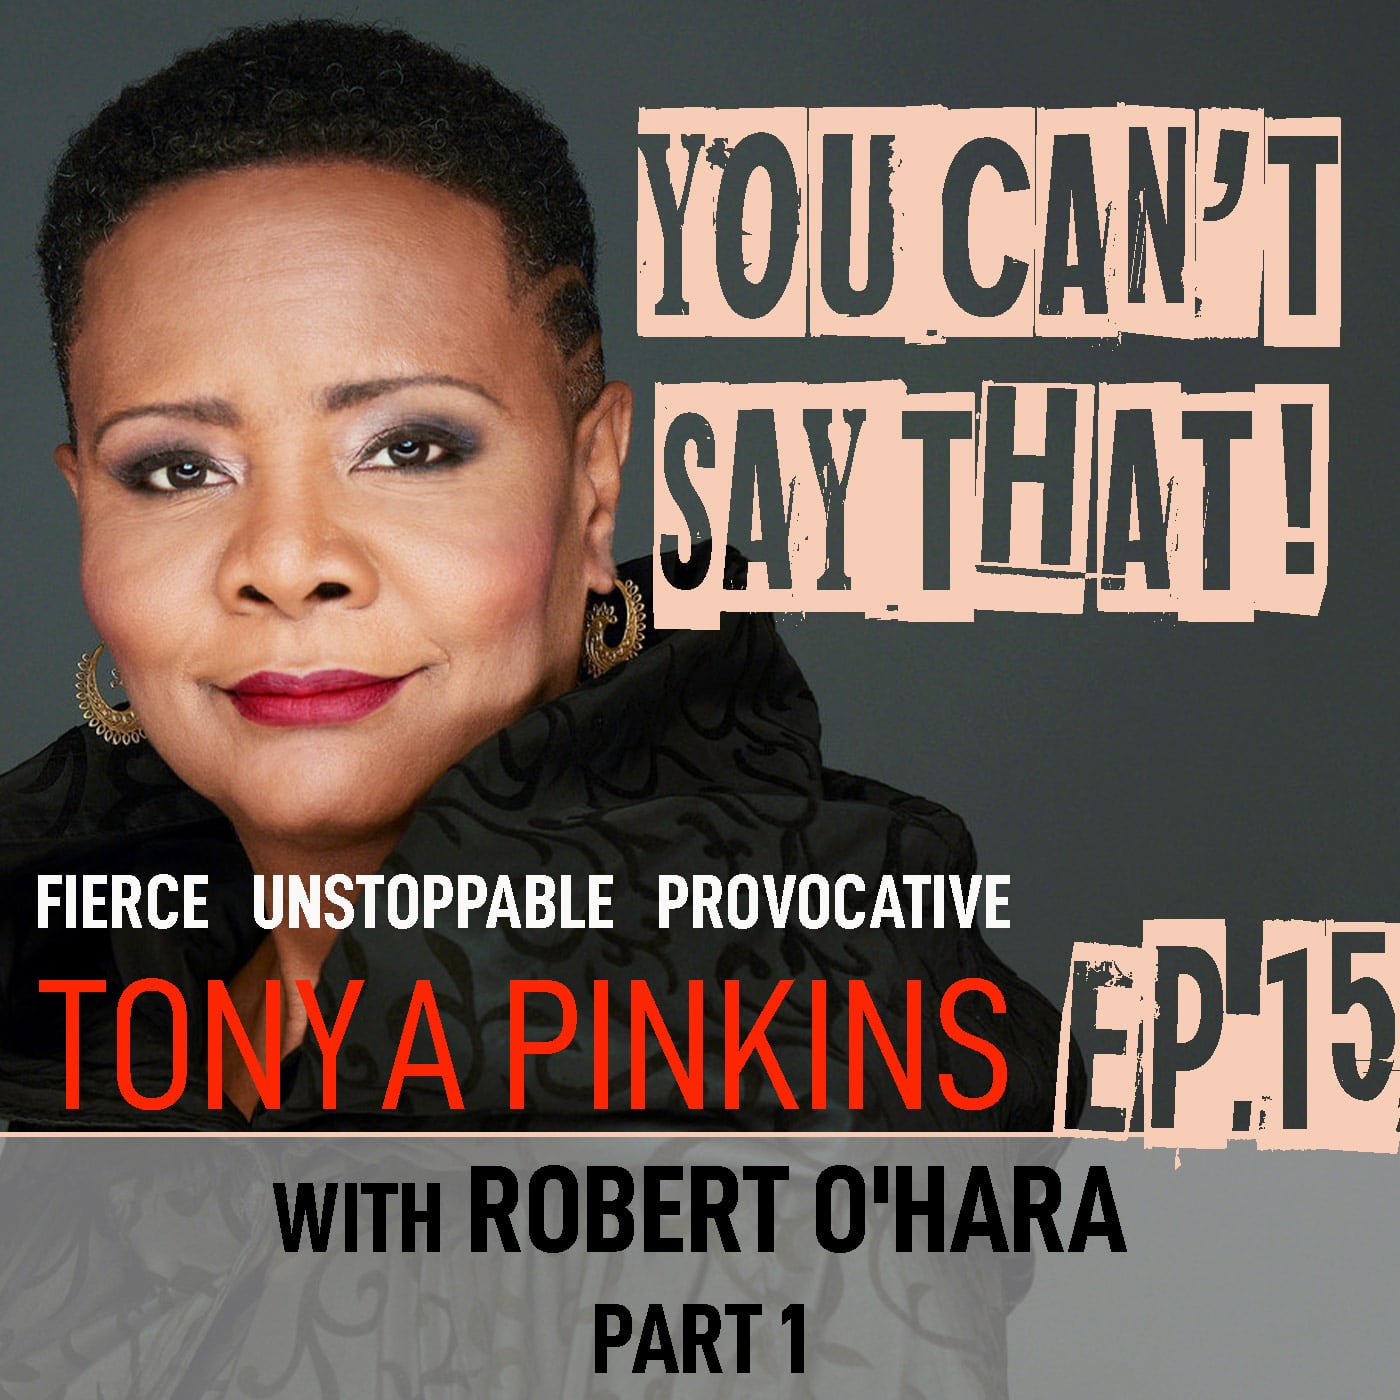 you Can't Say That Tonya Pinkins Episode 15 Robert O'Hara Part 1